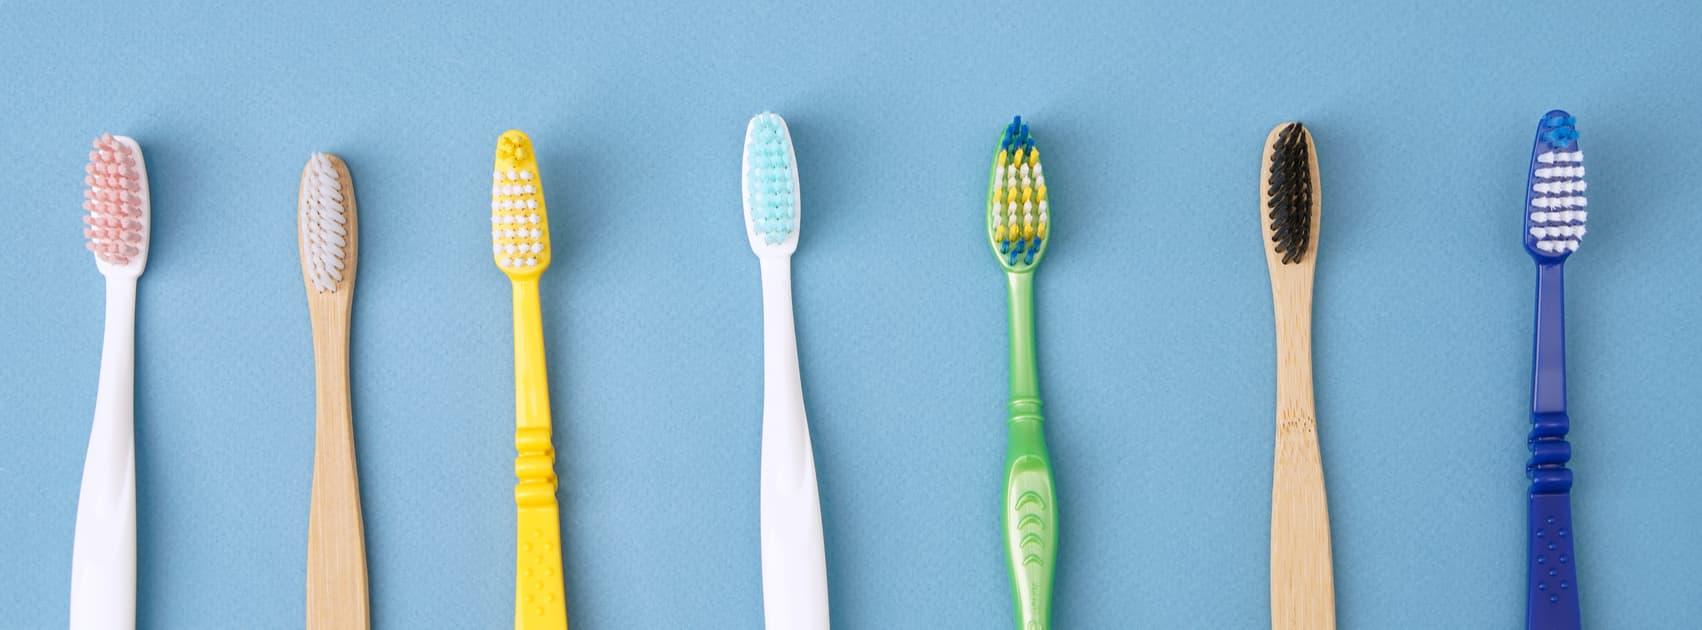 Soft vs Medium vs Hard Toothbrush